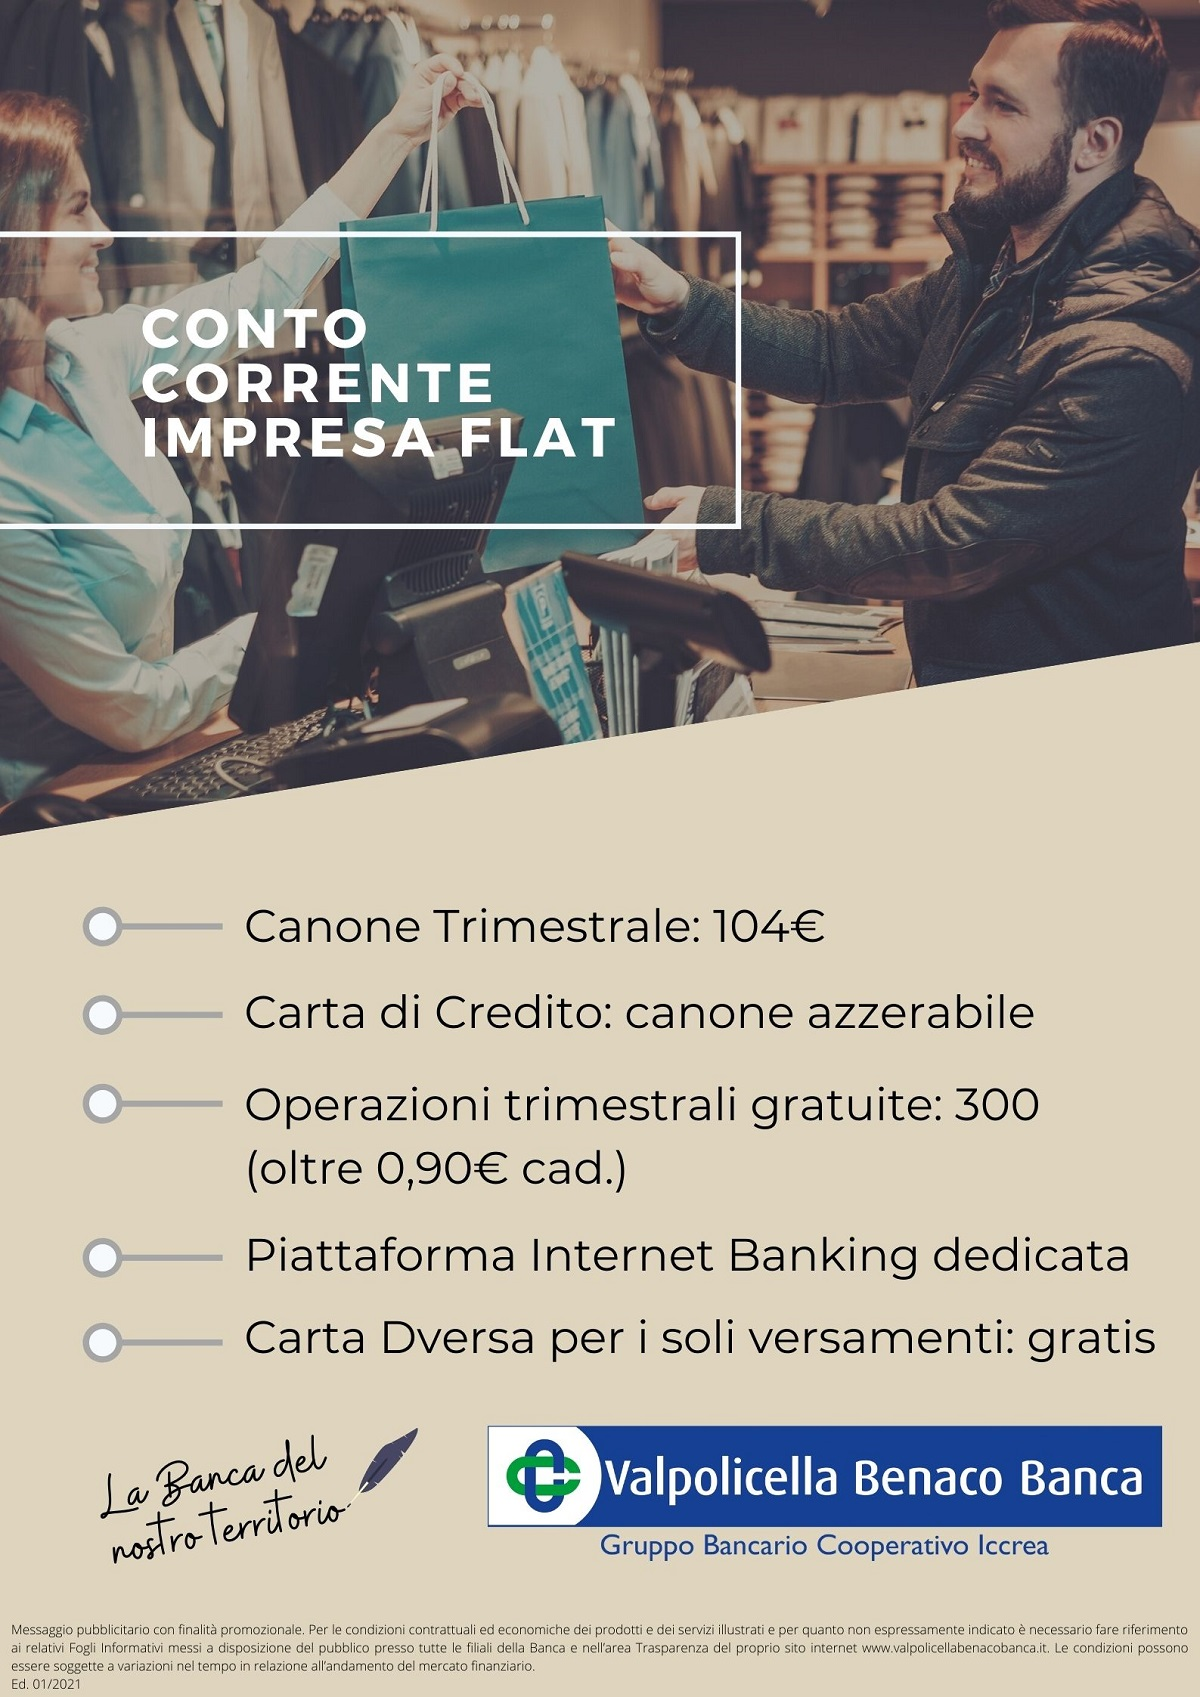 Conto Corrente Impresa Flat 2021